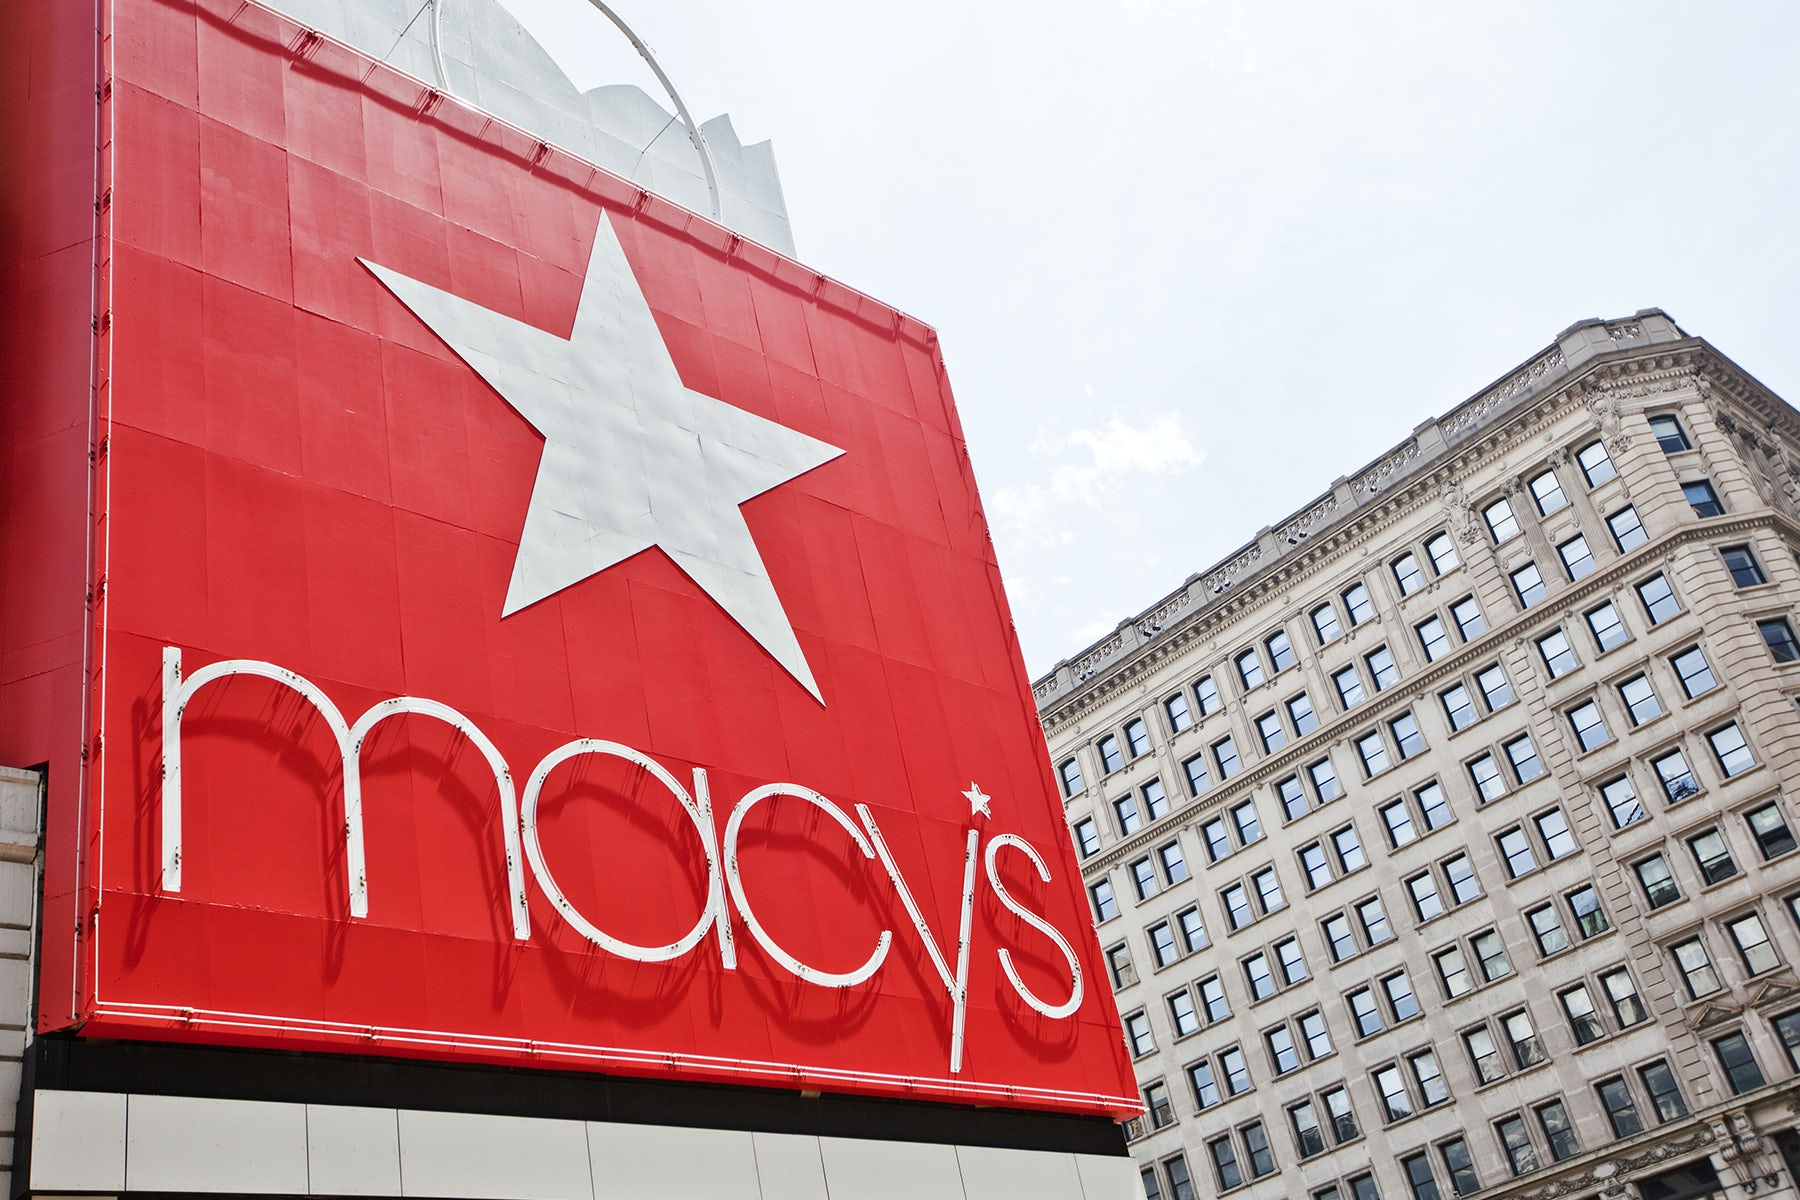 Macy's store in New York   Source: Shutterstock